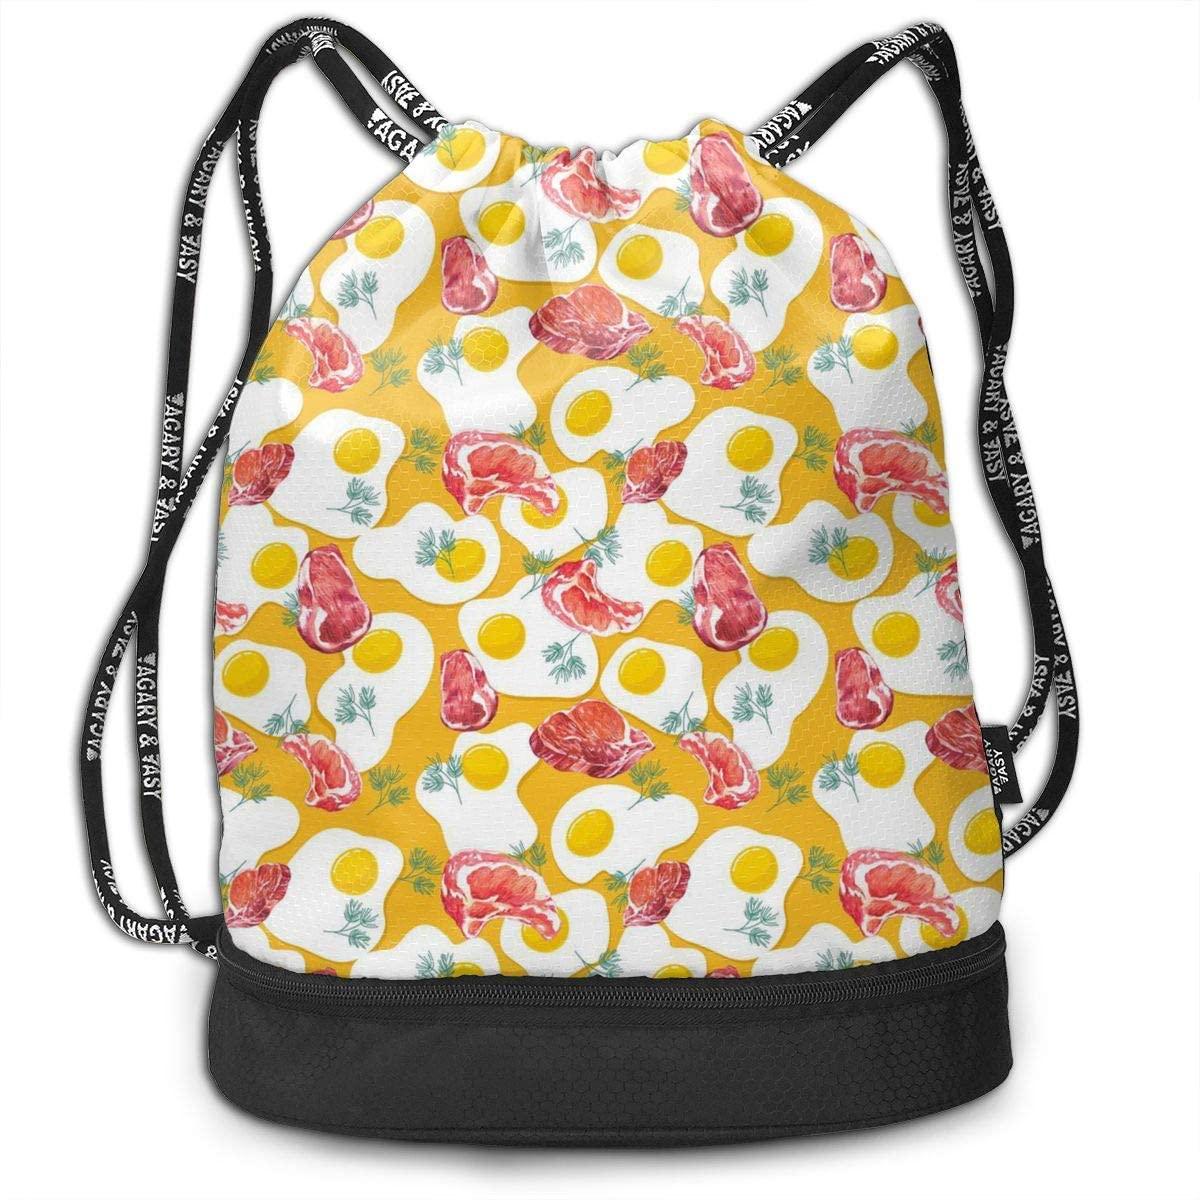 Bundle Backpacks Beef Steak Egg Gym Sack Drawstring Bags Casual Daypack Yoga Bag School Training Pouch